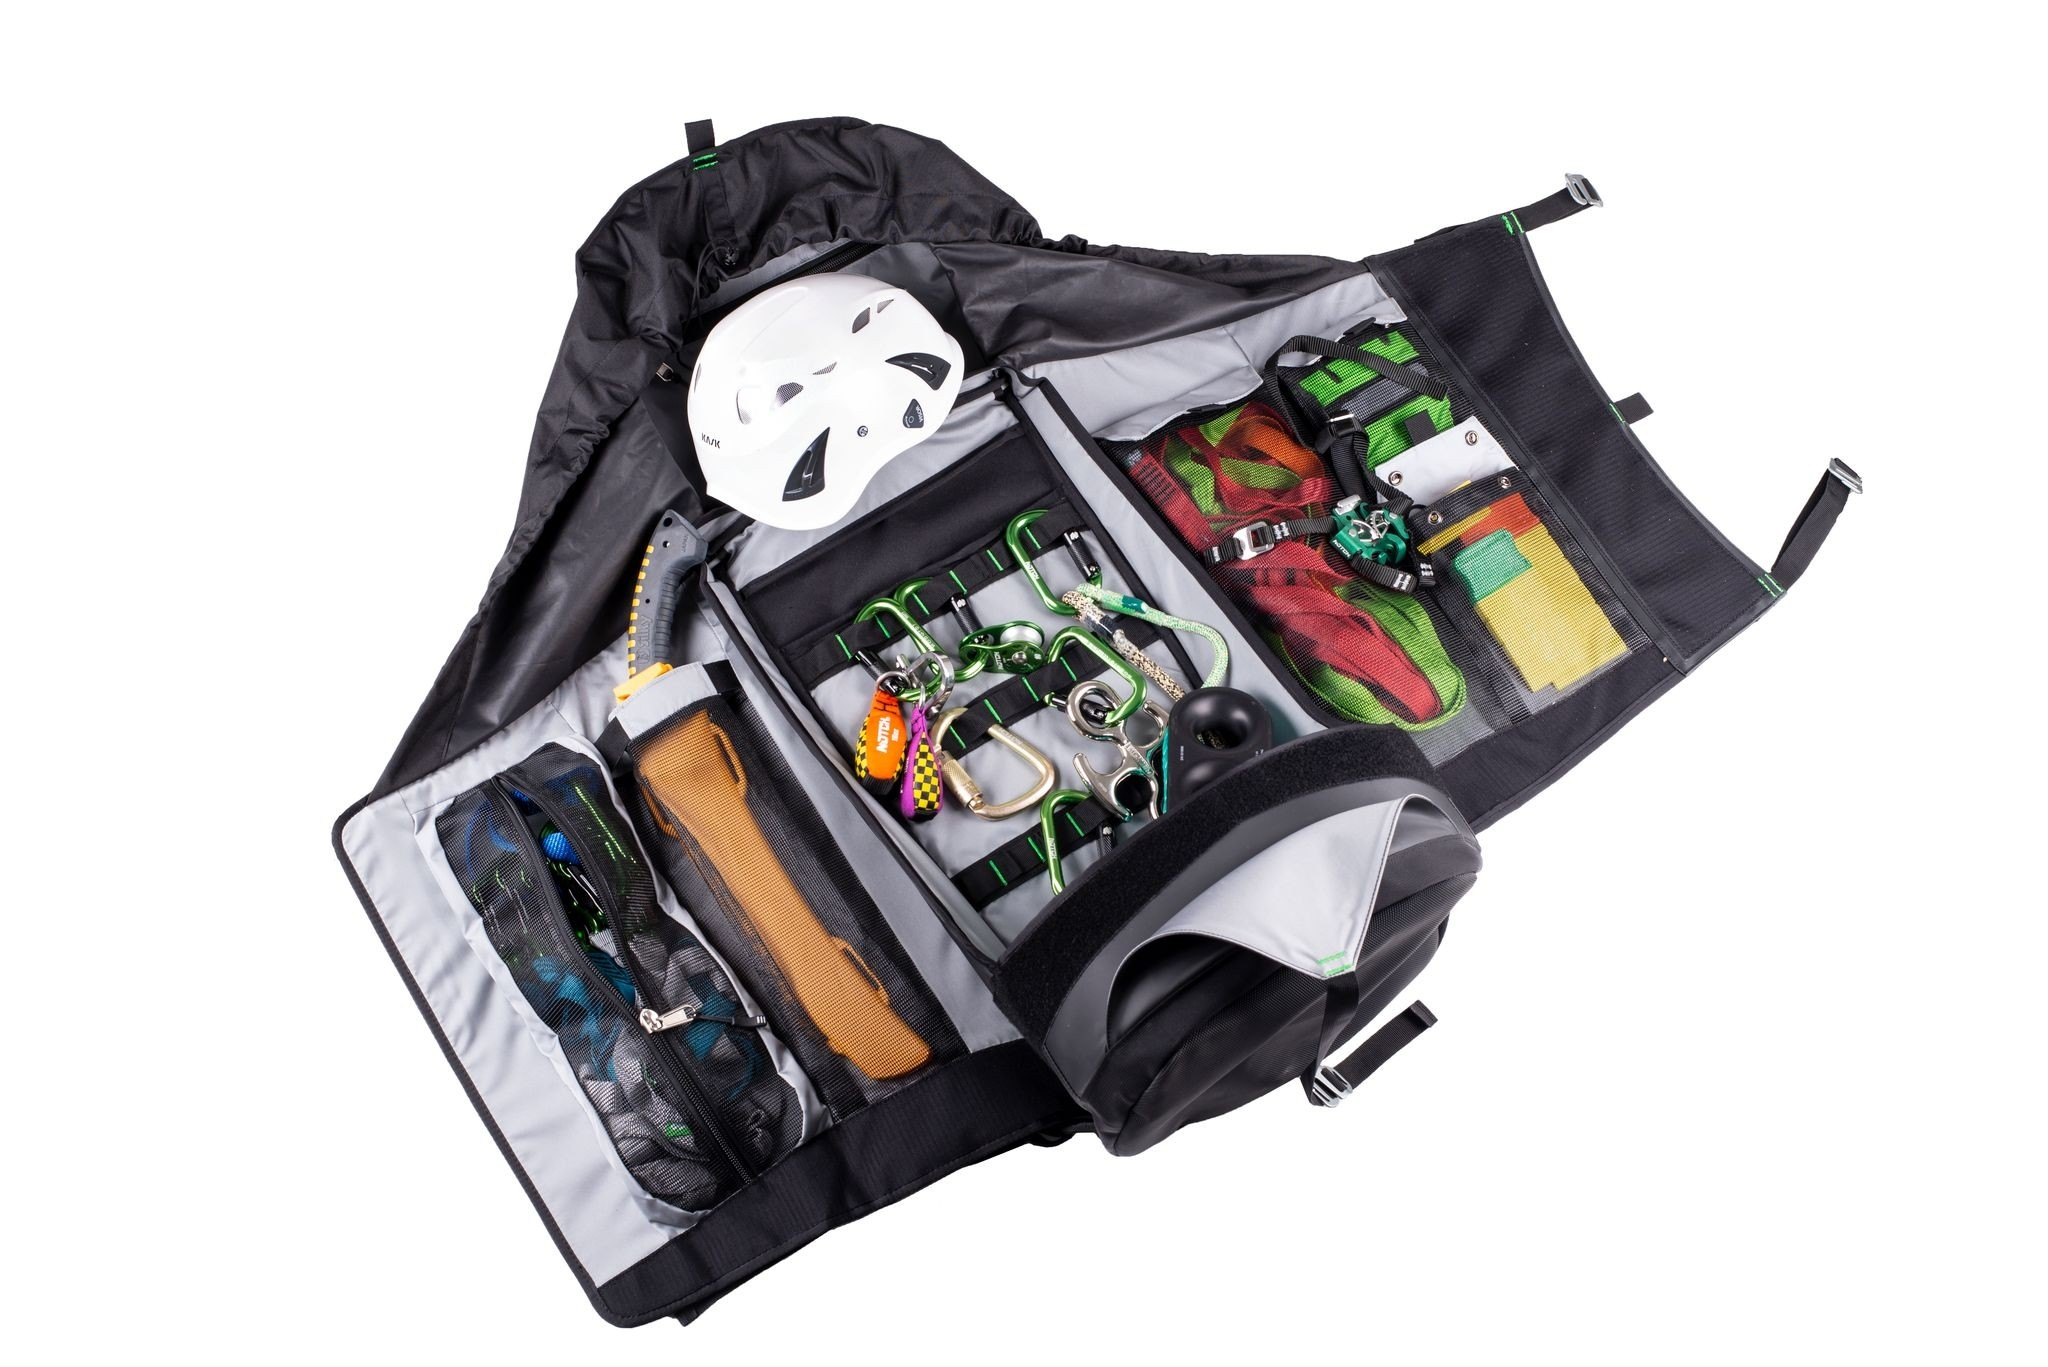 Notch Pro Access bag open